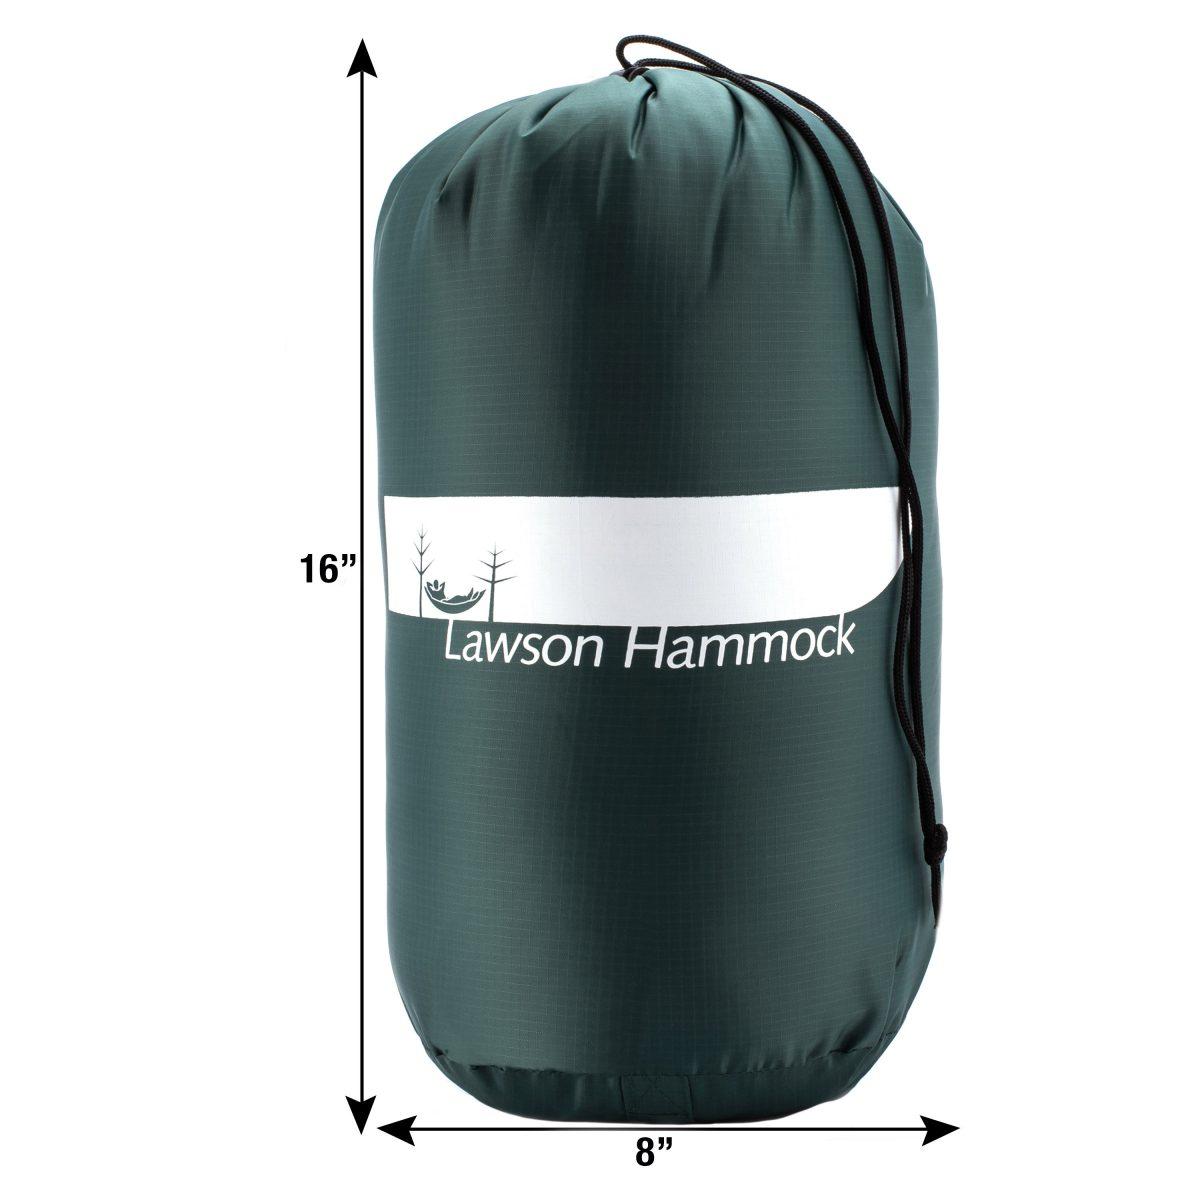 lawson hammock underquilt stuff sack